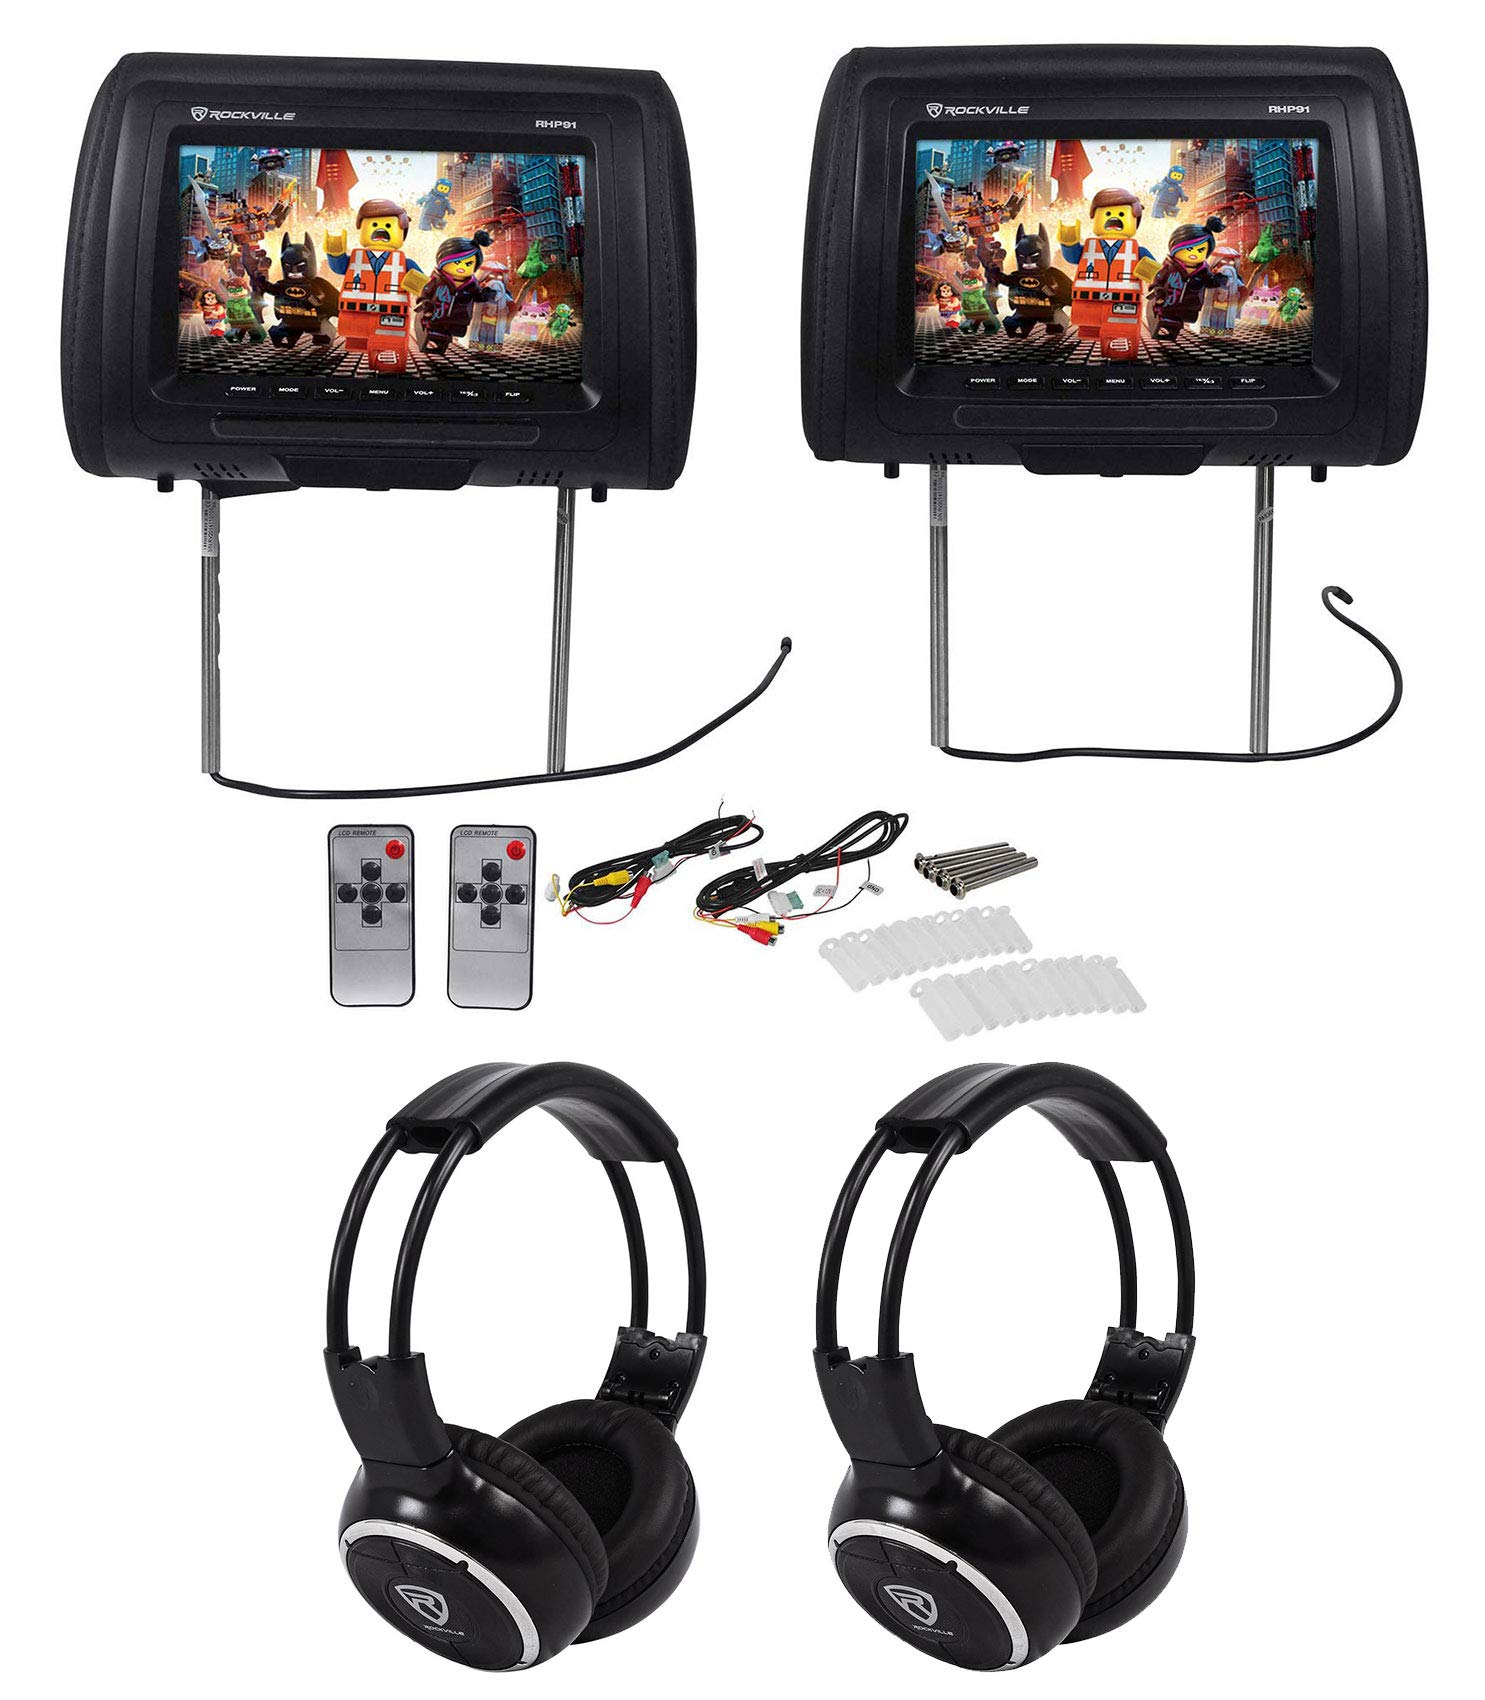 Pair Rockville RHP91-BK v2 9'' Black Car Headrest Monitors w/Speakers+Headphones by Rockville